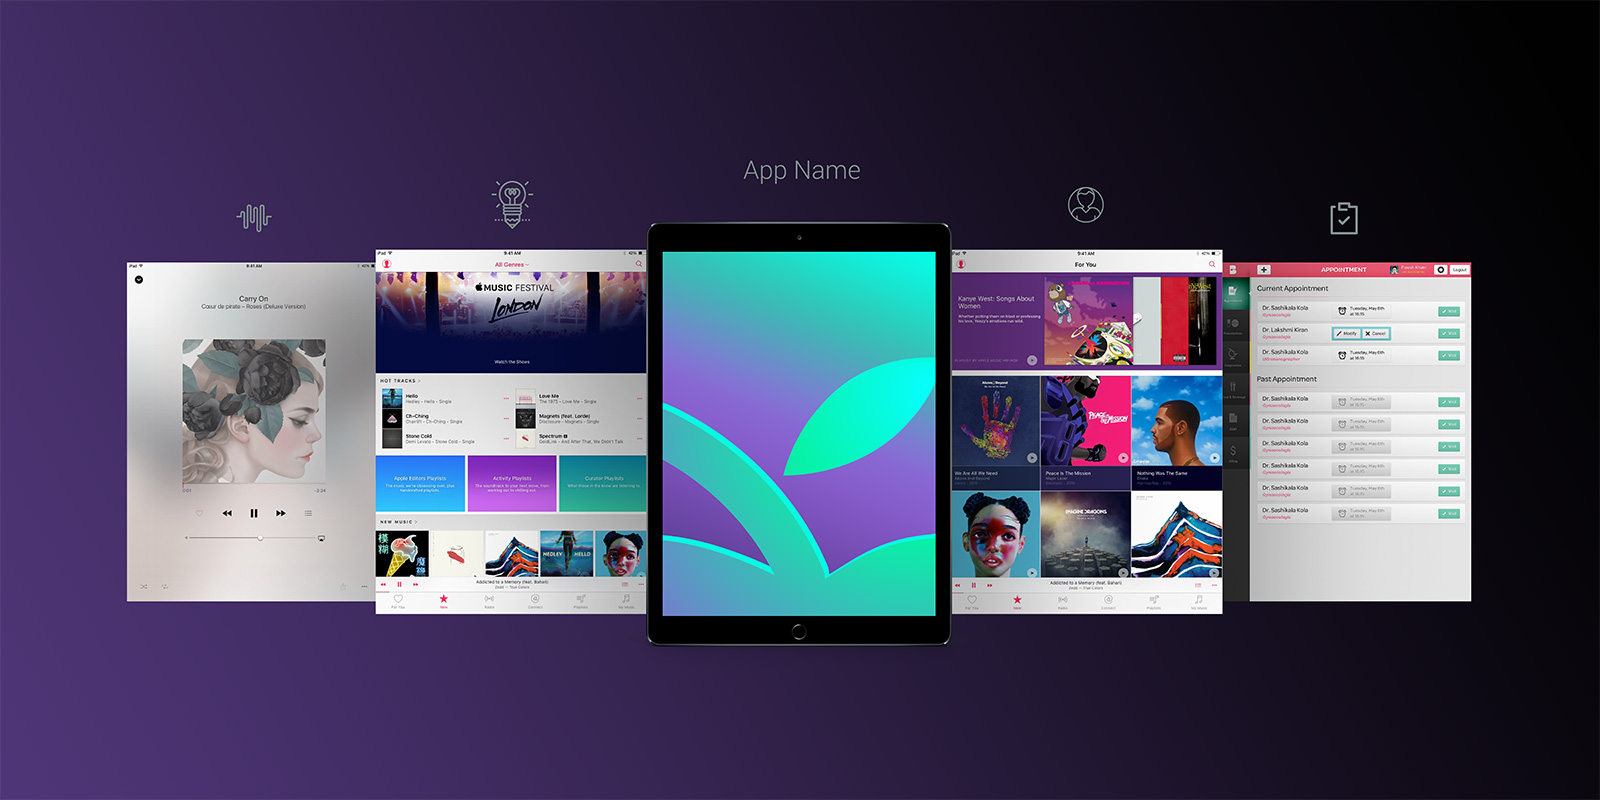 Free-iPad-Pro-App-Screen-Mockup-PSD